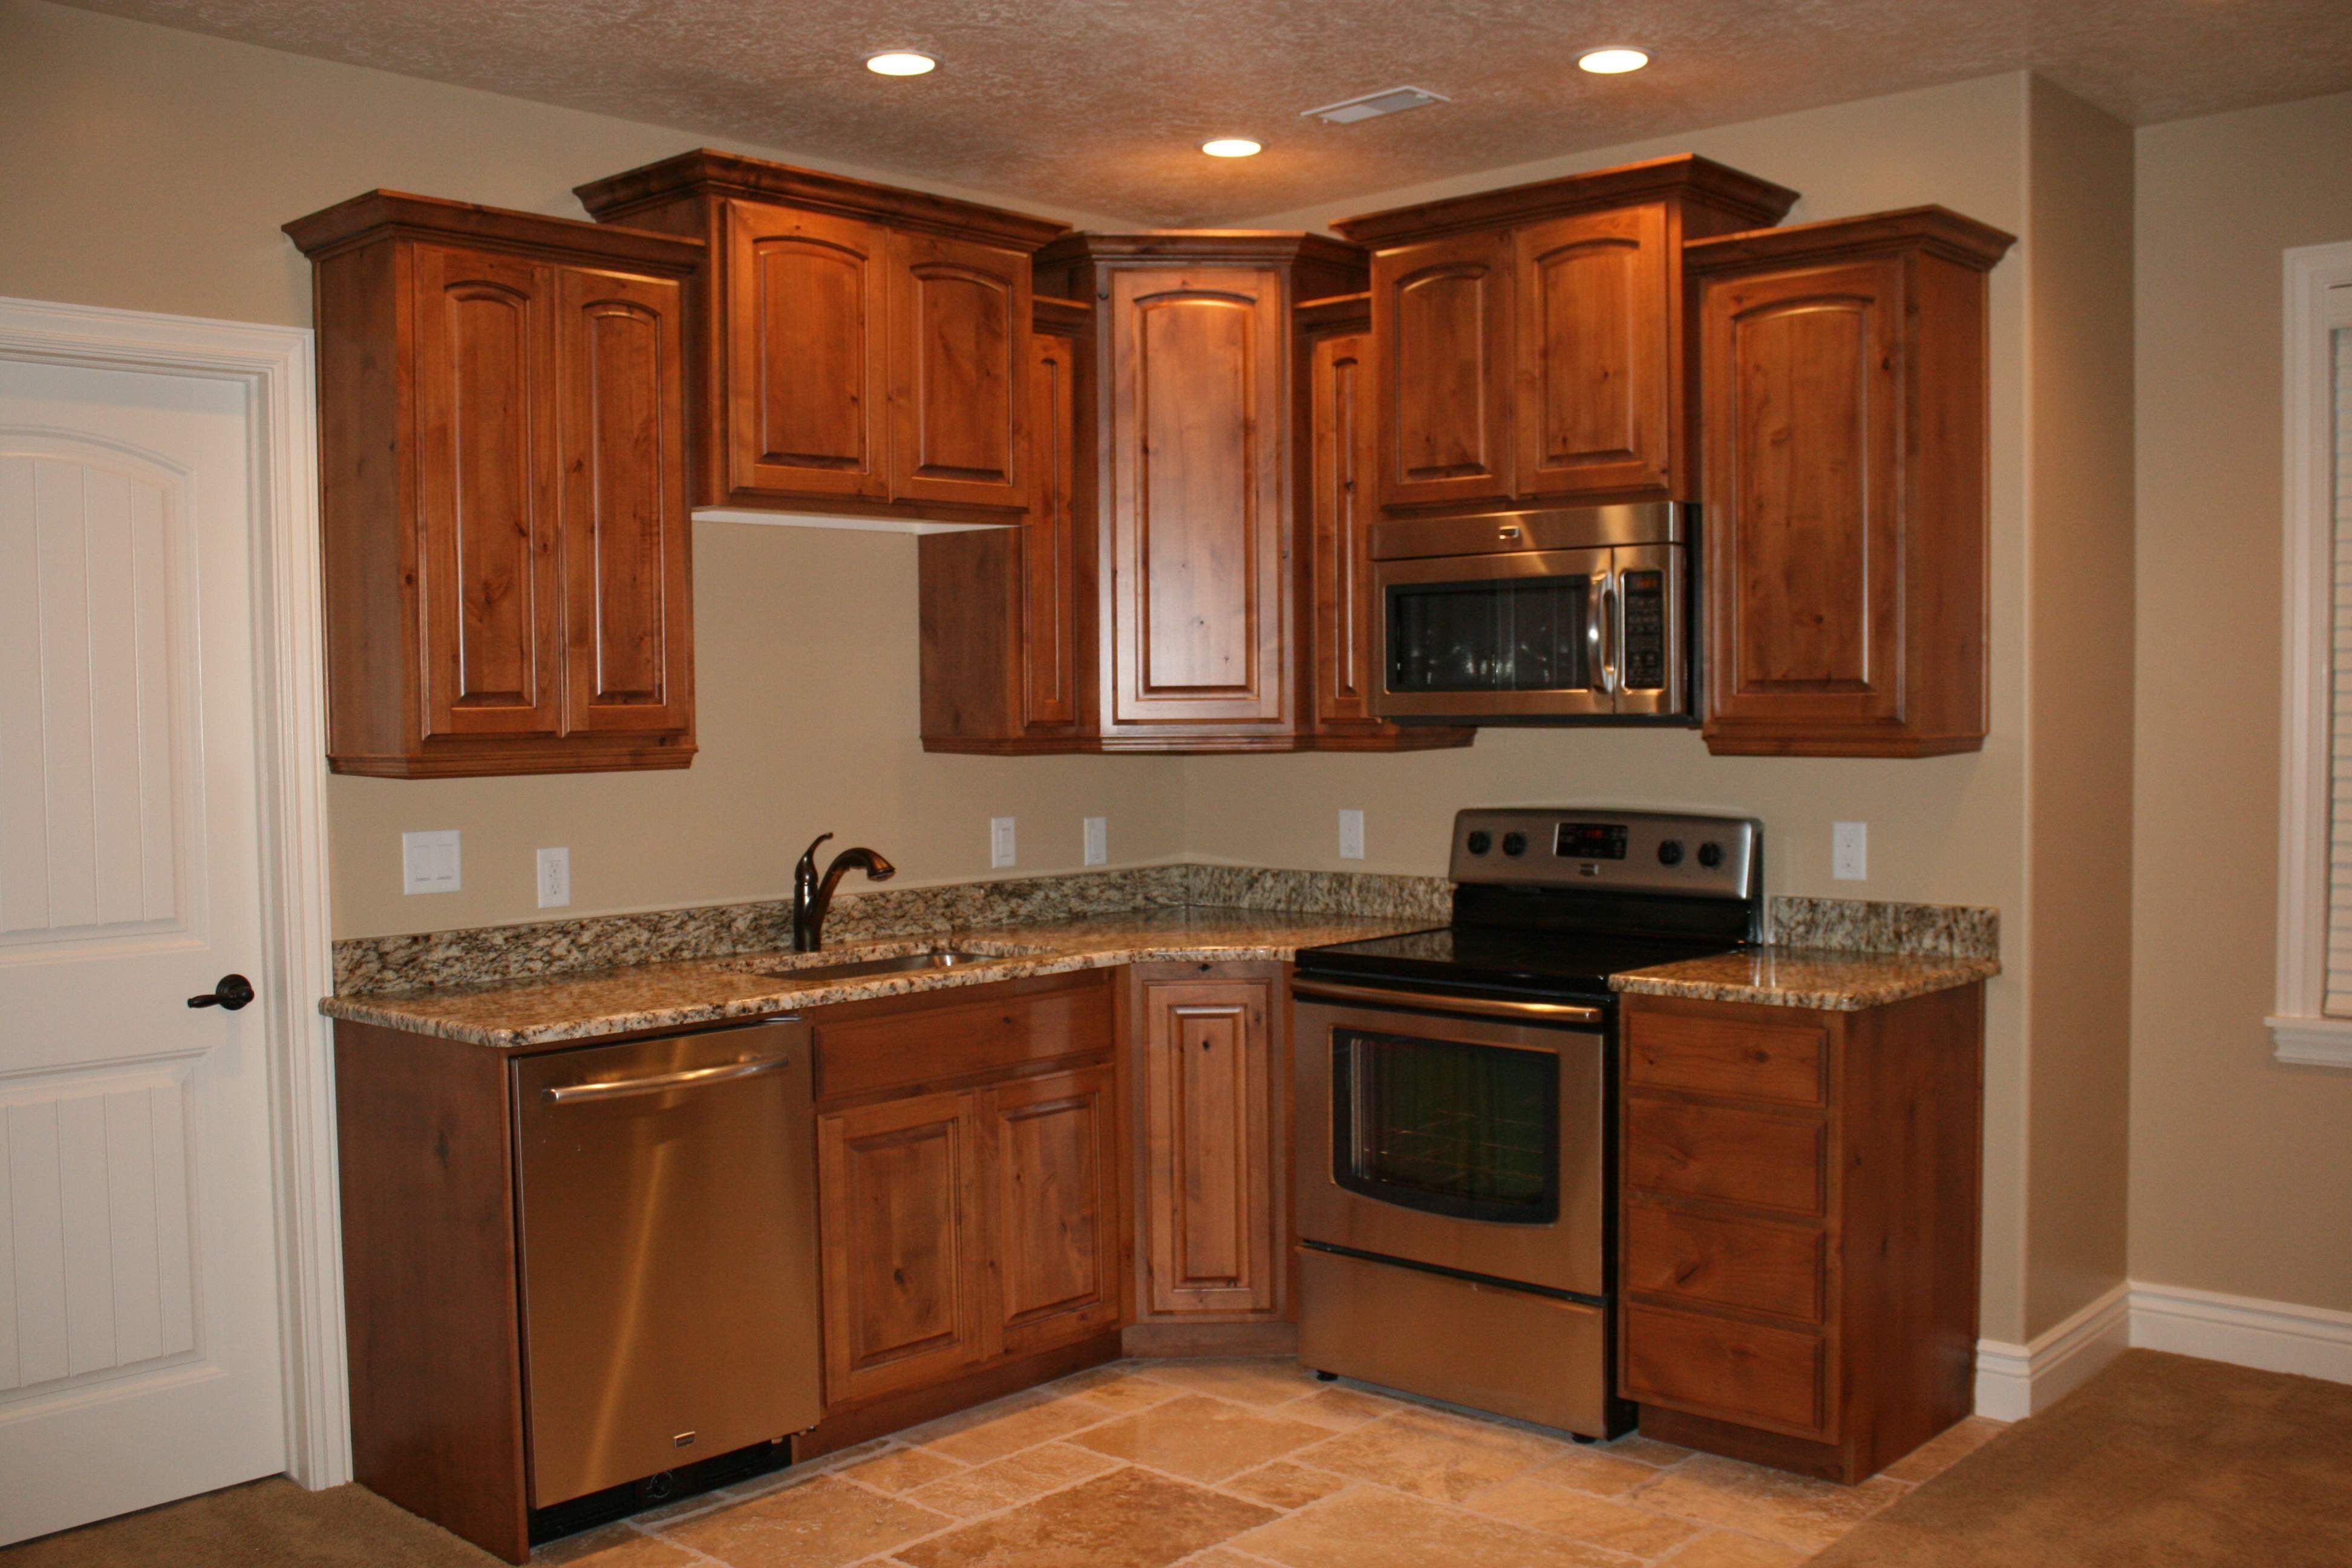 Basement Kitchenette Kitchens Ideas Hd Homes Inspiration Idea